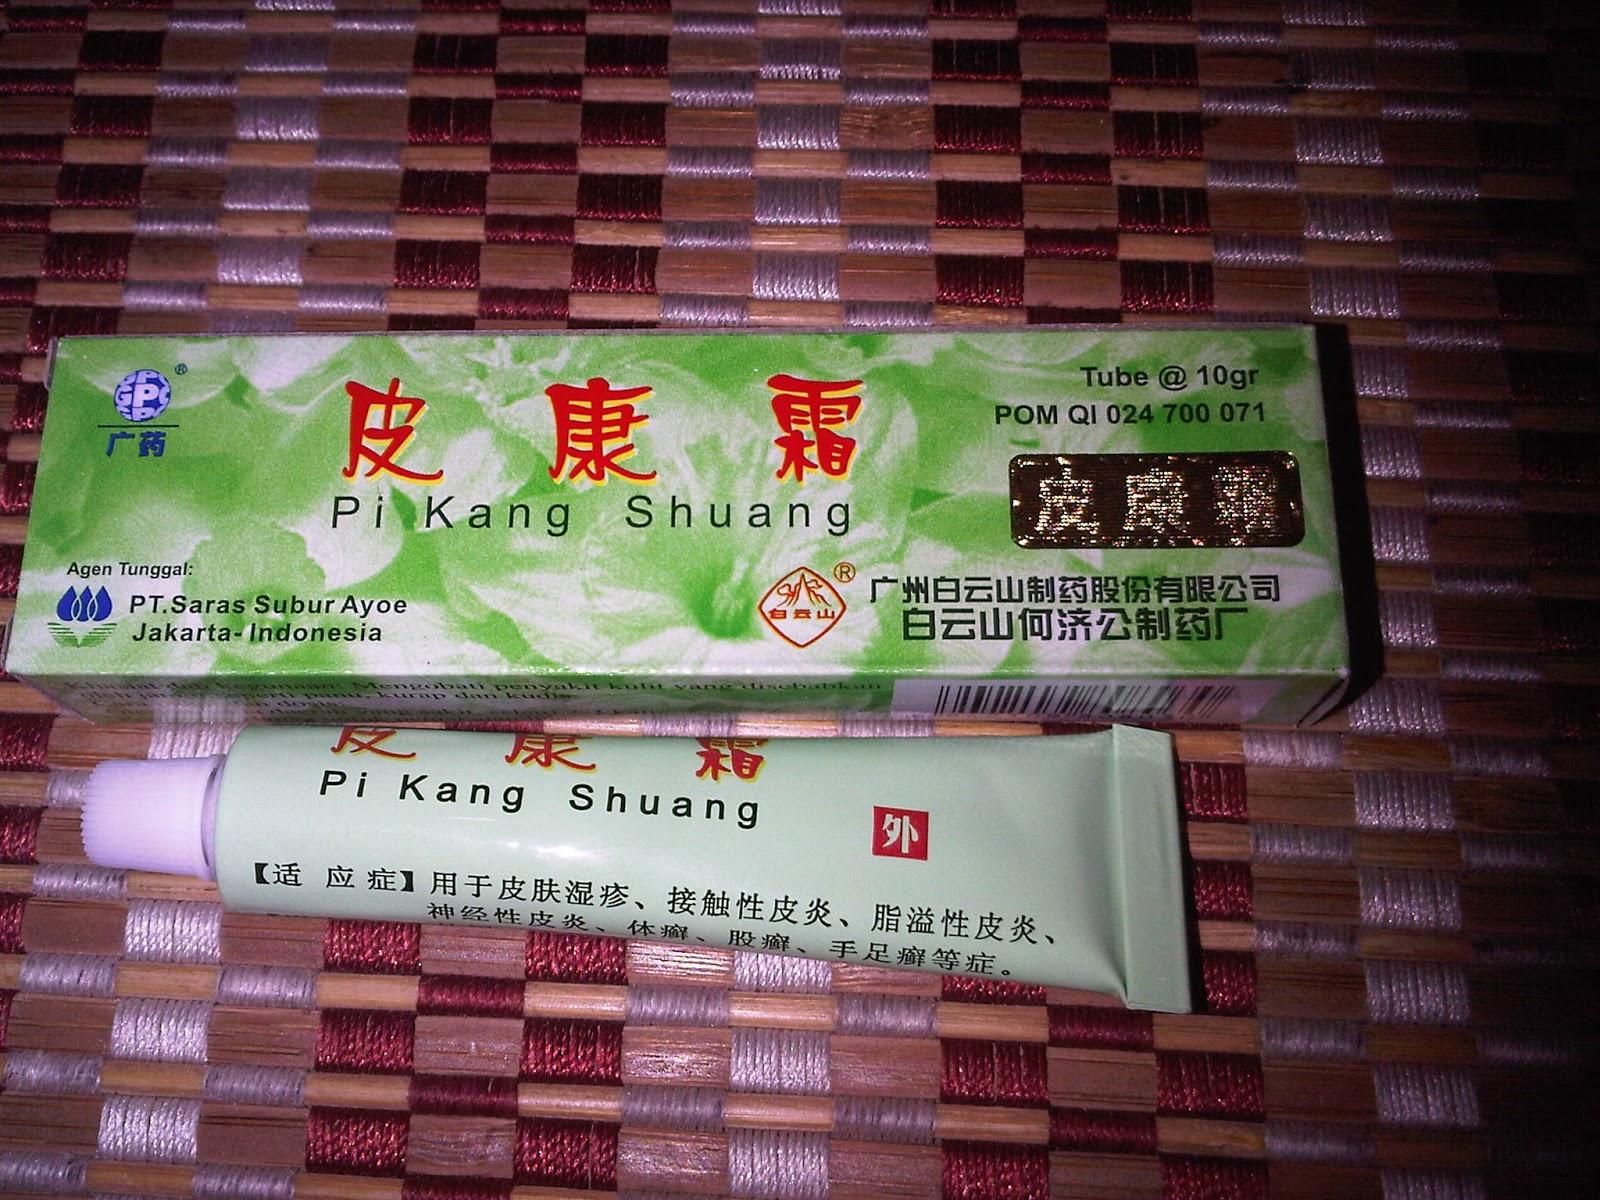 2 Tube 20 Gram Salep Pi Kang Shuang Obat Penyakit Kulit Daftar P Sf Pks Cream Suang Biru Jual Resmi Pom Panu